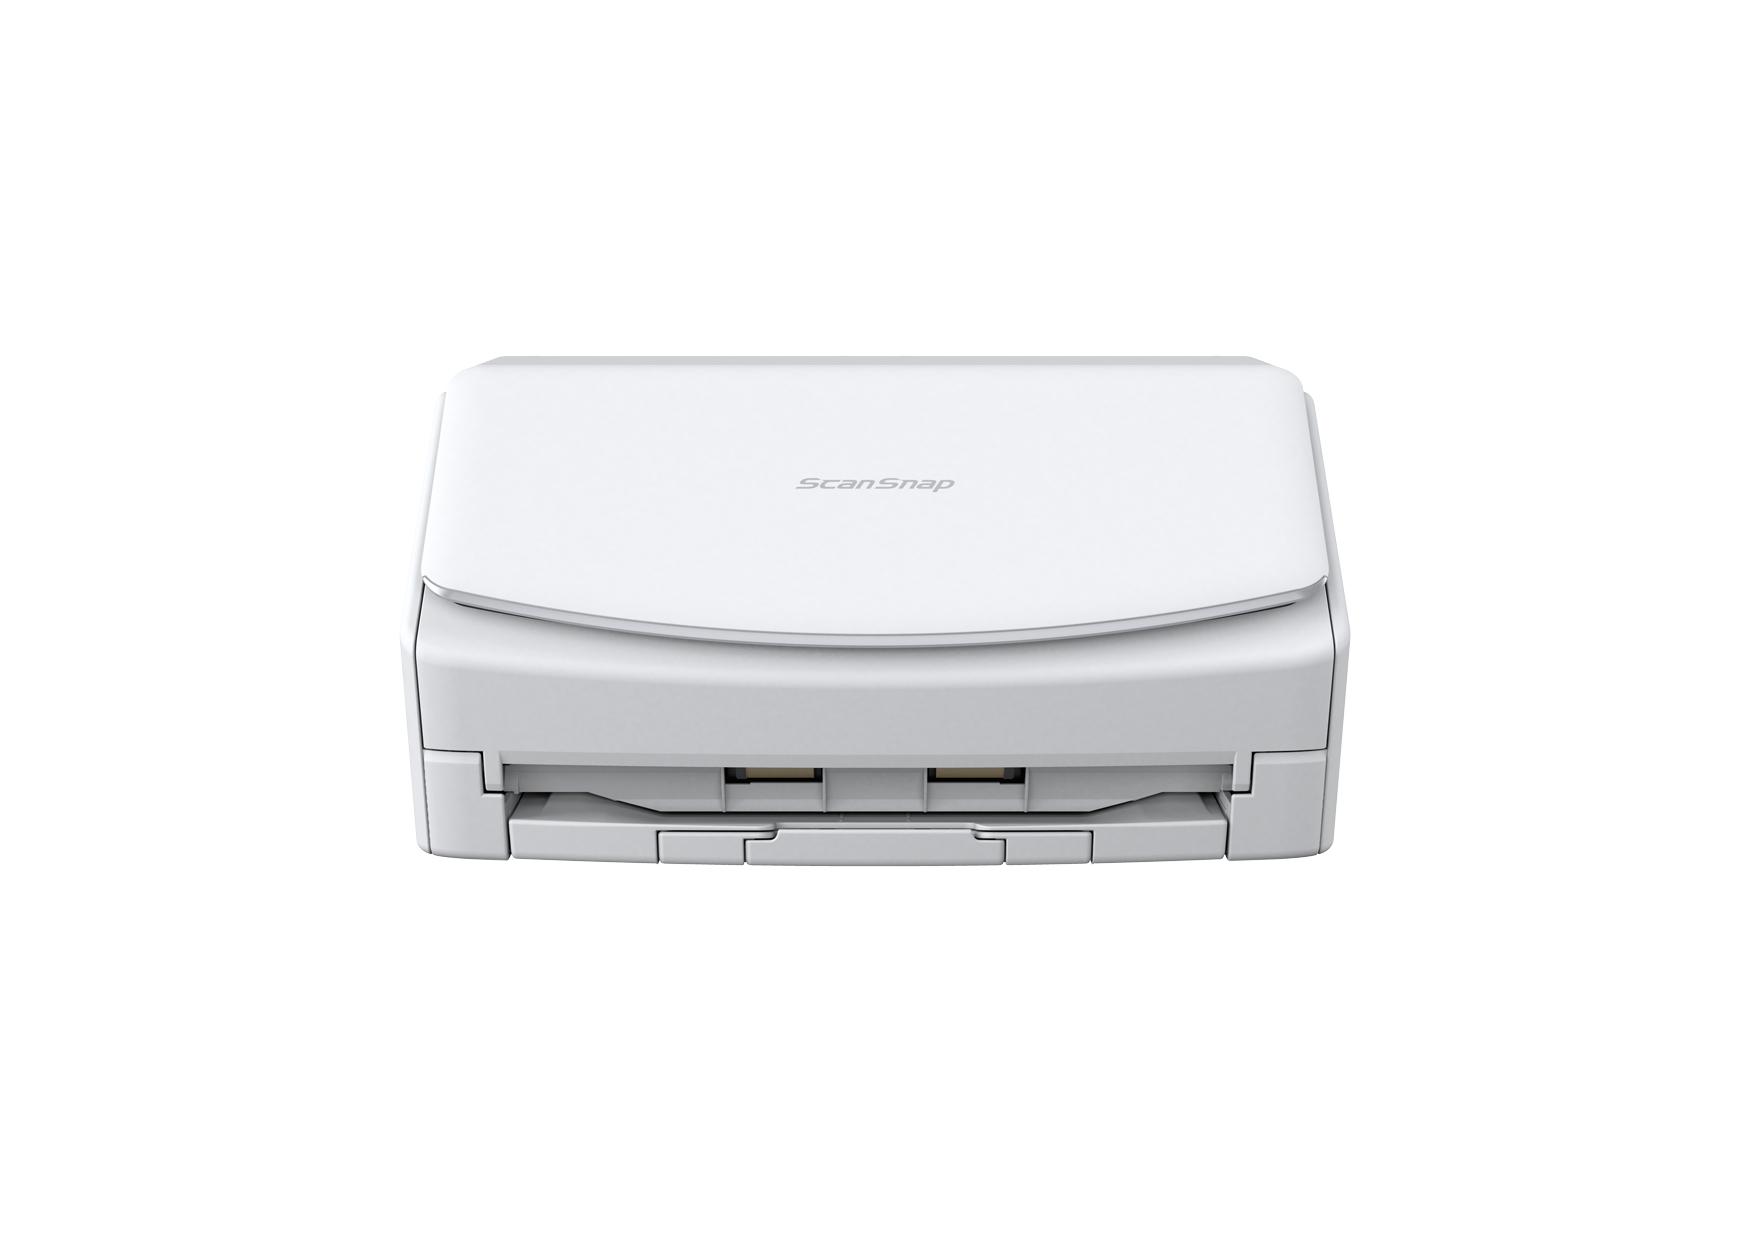 Fujitsu ScanSnap iX1500 ADF + Manual feed scanner 600 x 600 DPI A3 White